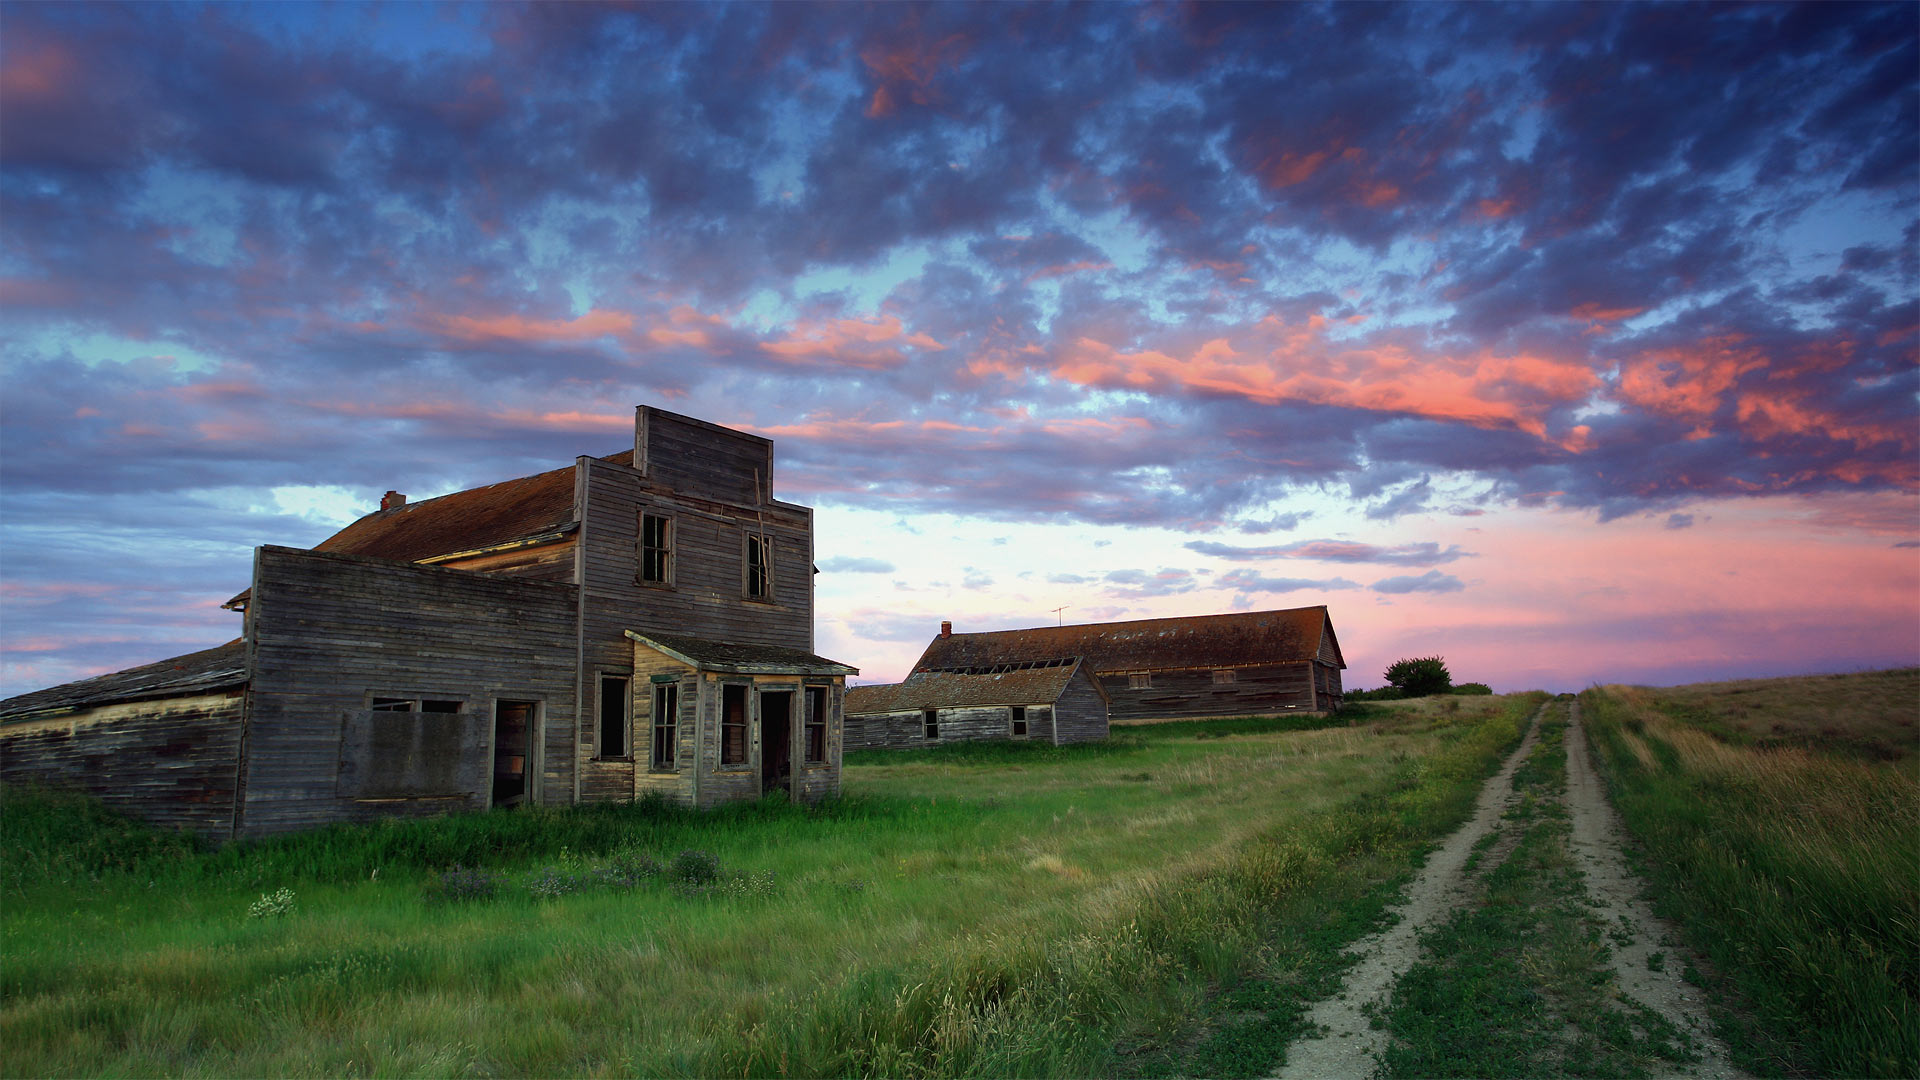 Old general store of Bents, Saskatchewan, Canada (© ImagineGolf/Getty Images)